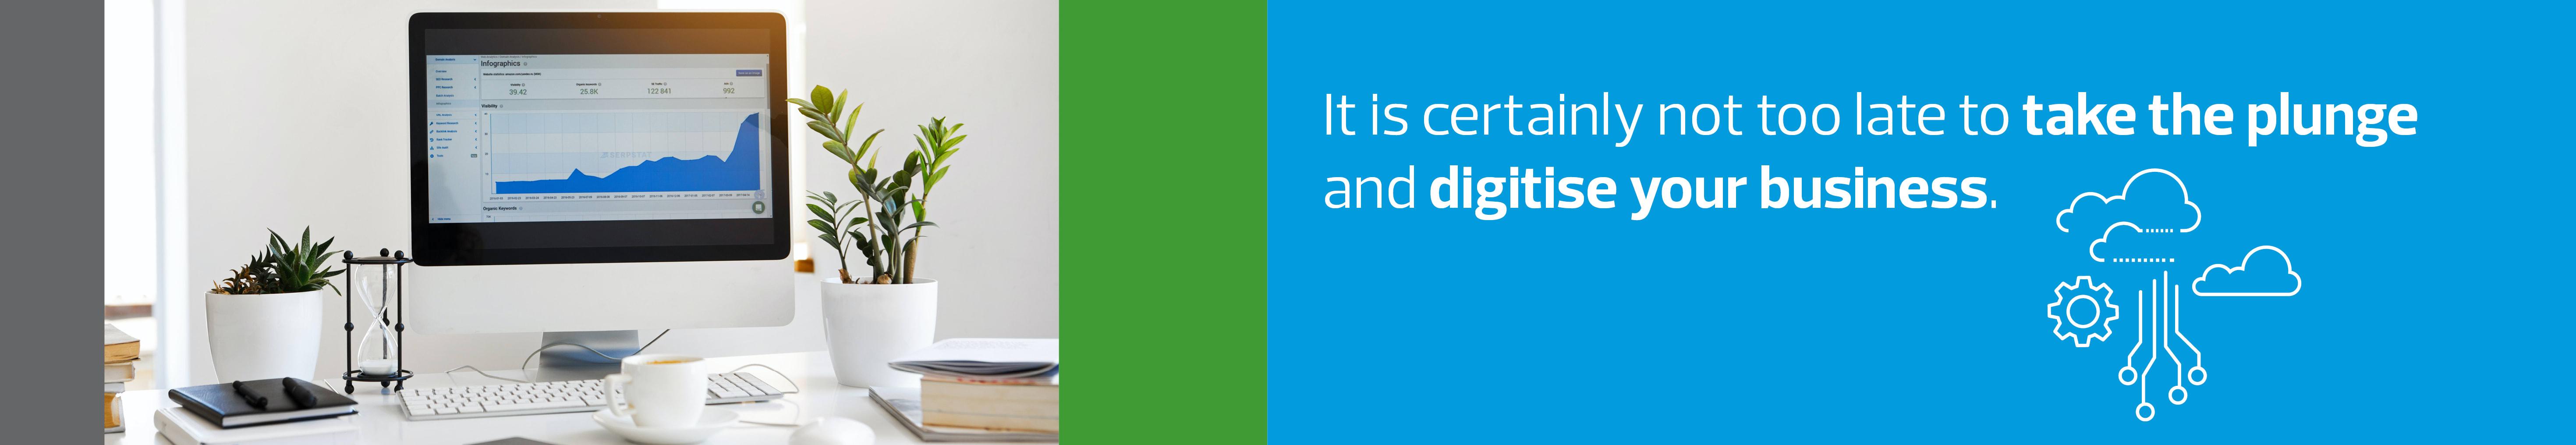 Digital transformation for SMEs